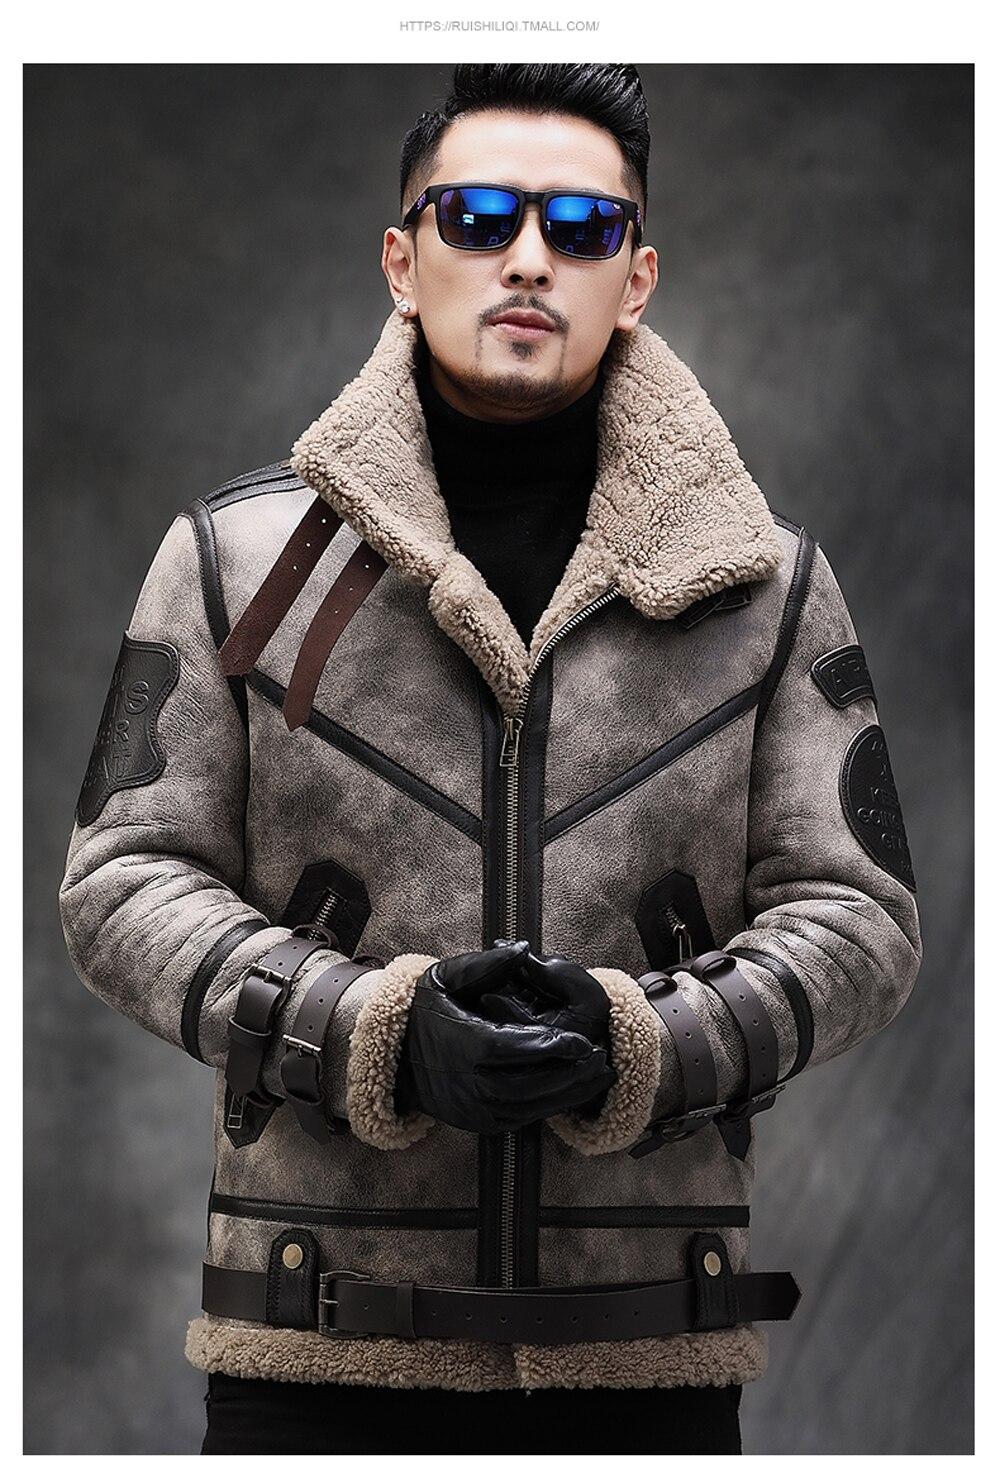 Hcc554aa5555d4f909a48350d5fcc0c7dR 2019 Fashion 100% Quality Real Sheepskin Fur Men Coat Genuine Full Pelt Sheep Shearling Male Winter Jacket Brown Men Fur Outwear